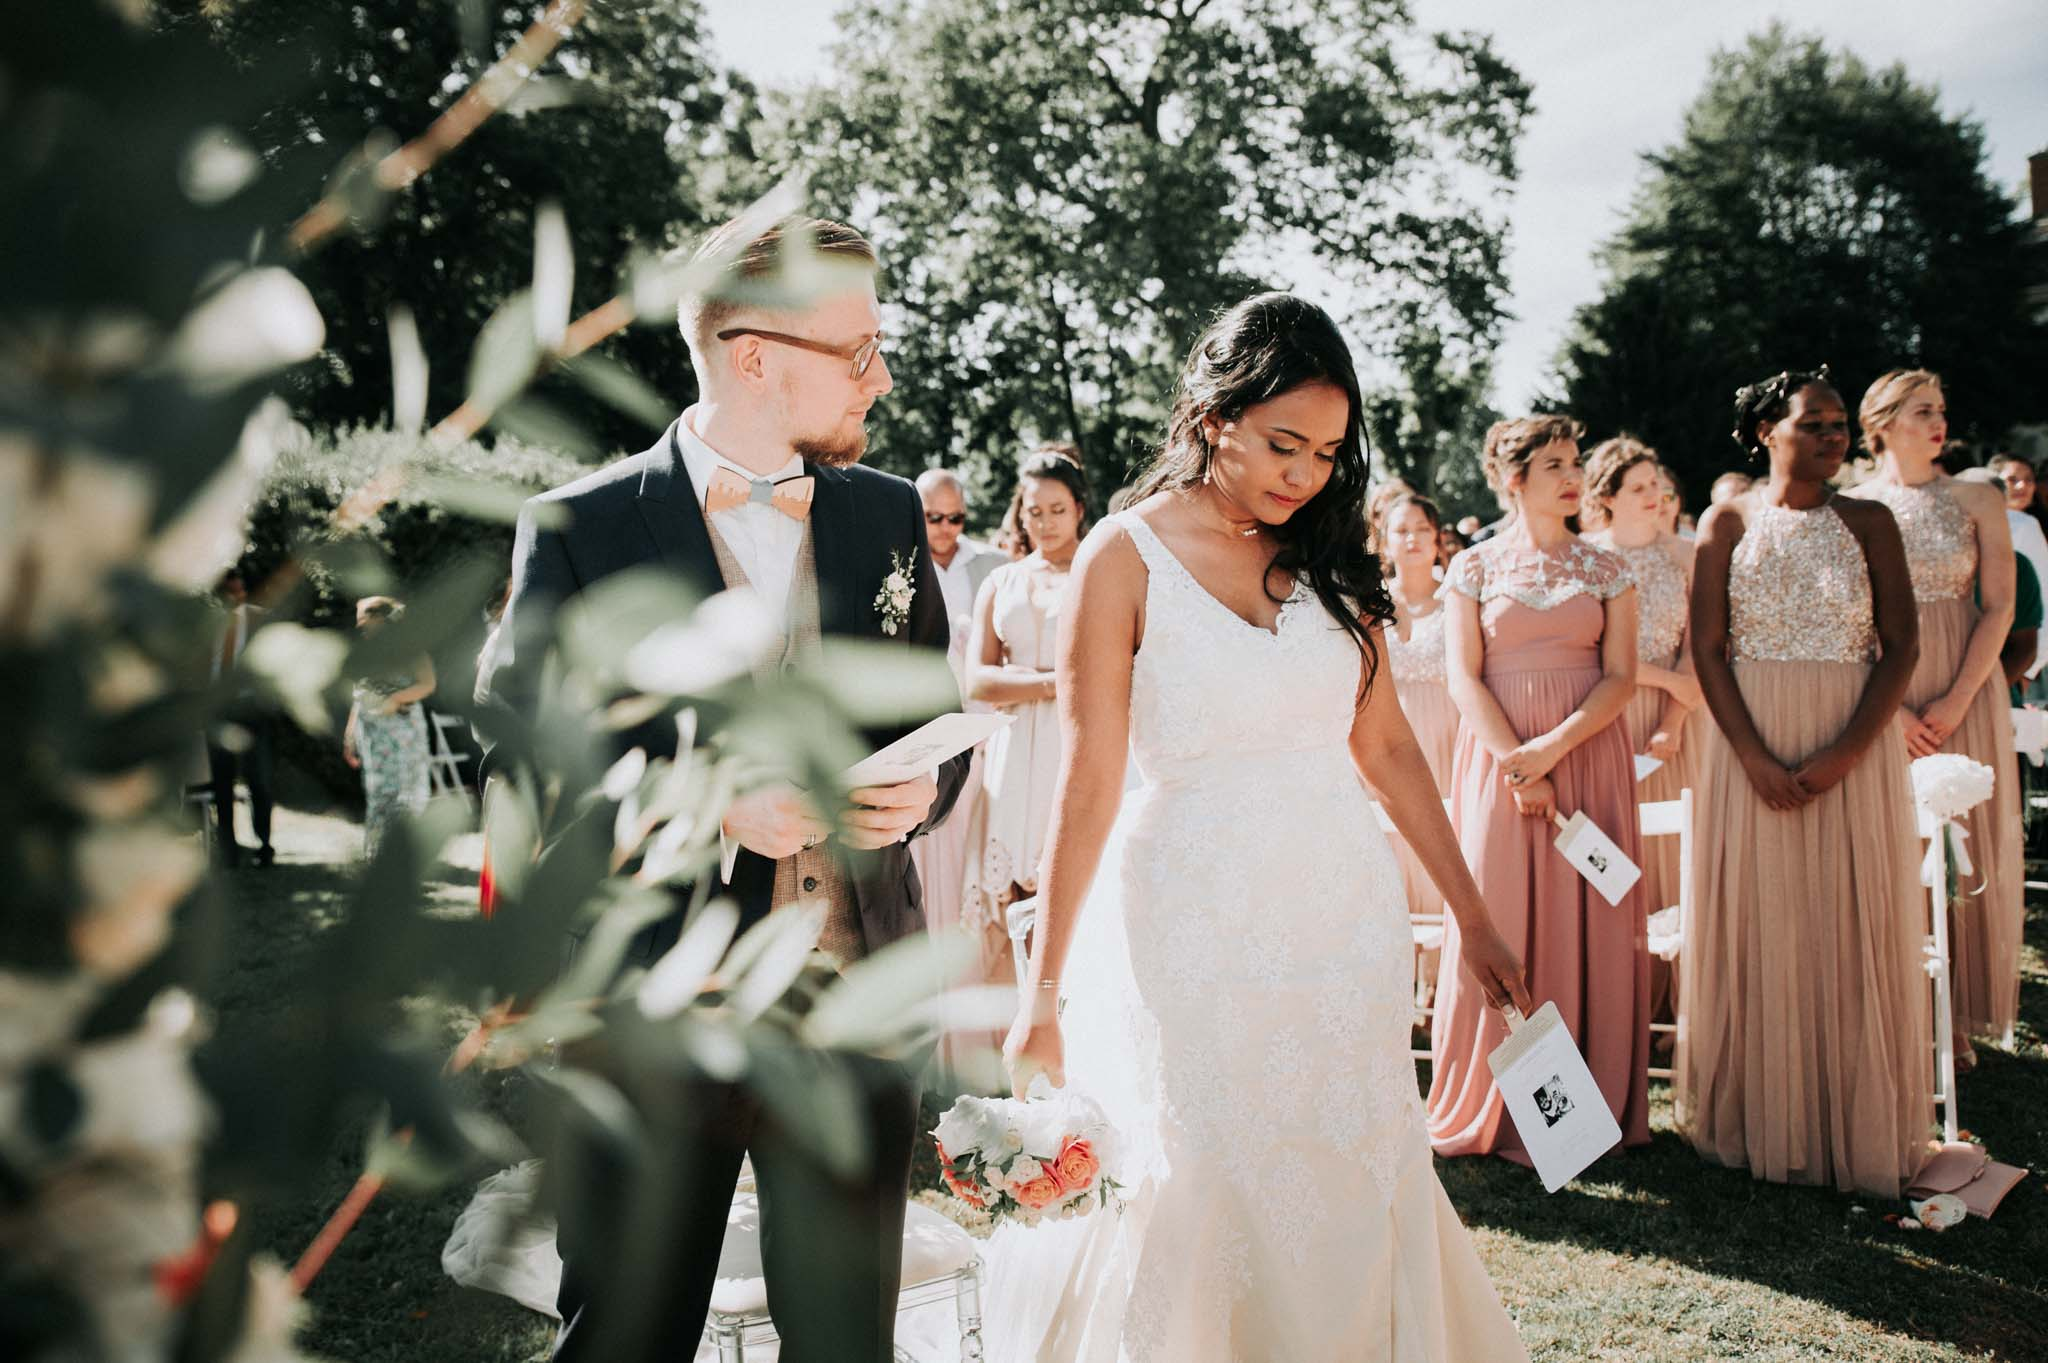 2017-07-15 - DSC_8121 - photographe - mariage - www.lauriediazwedding.com.jpg